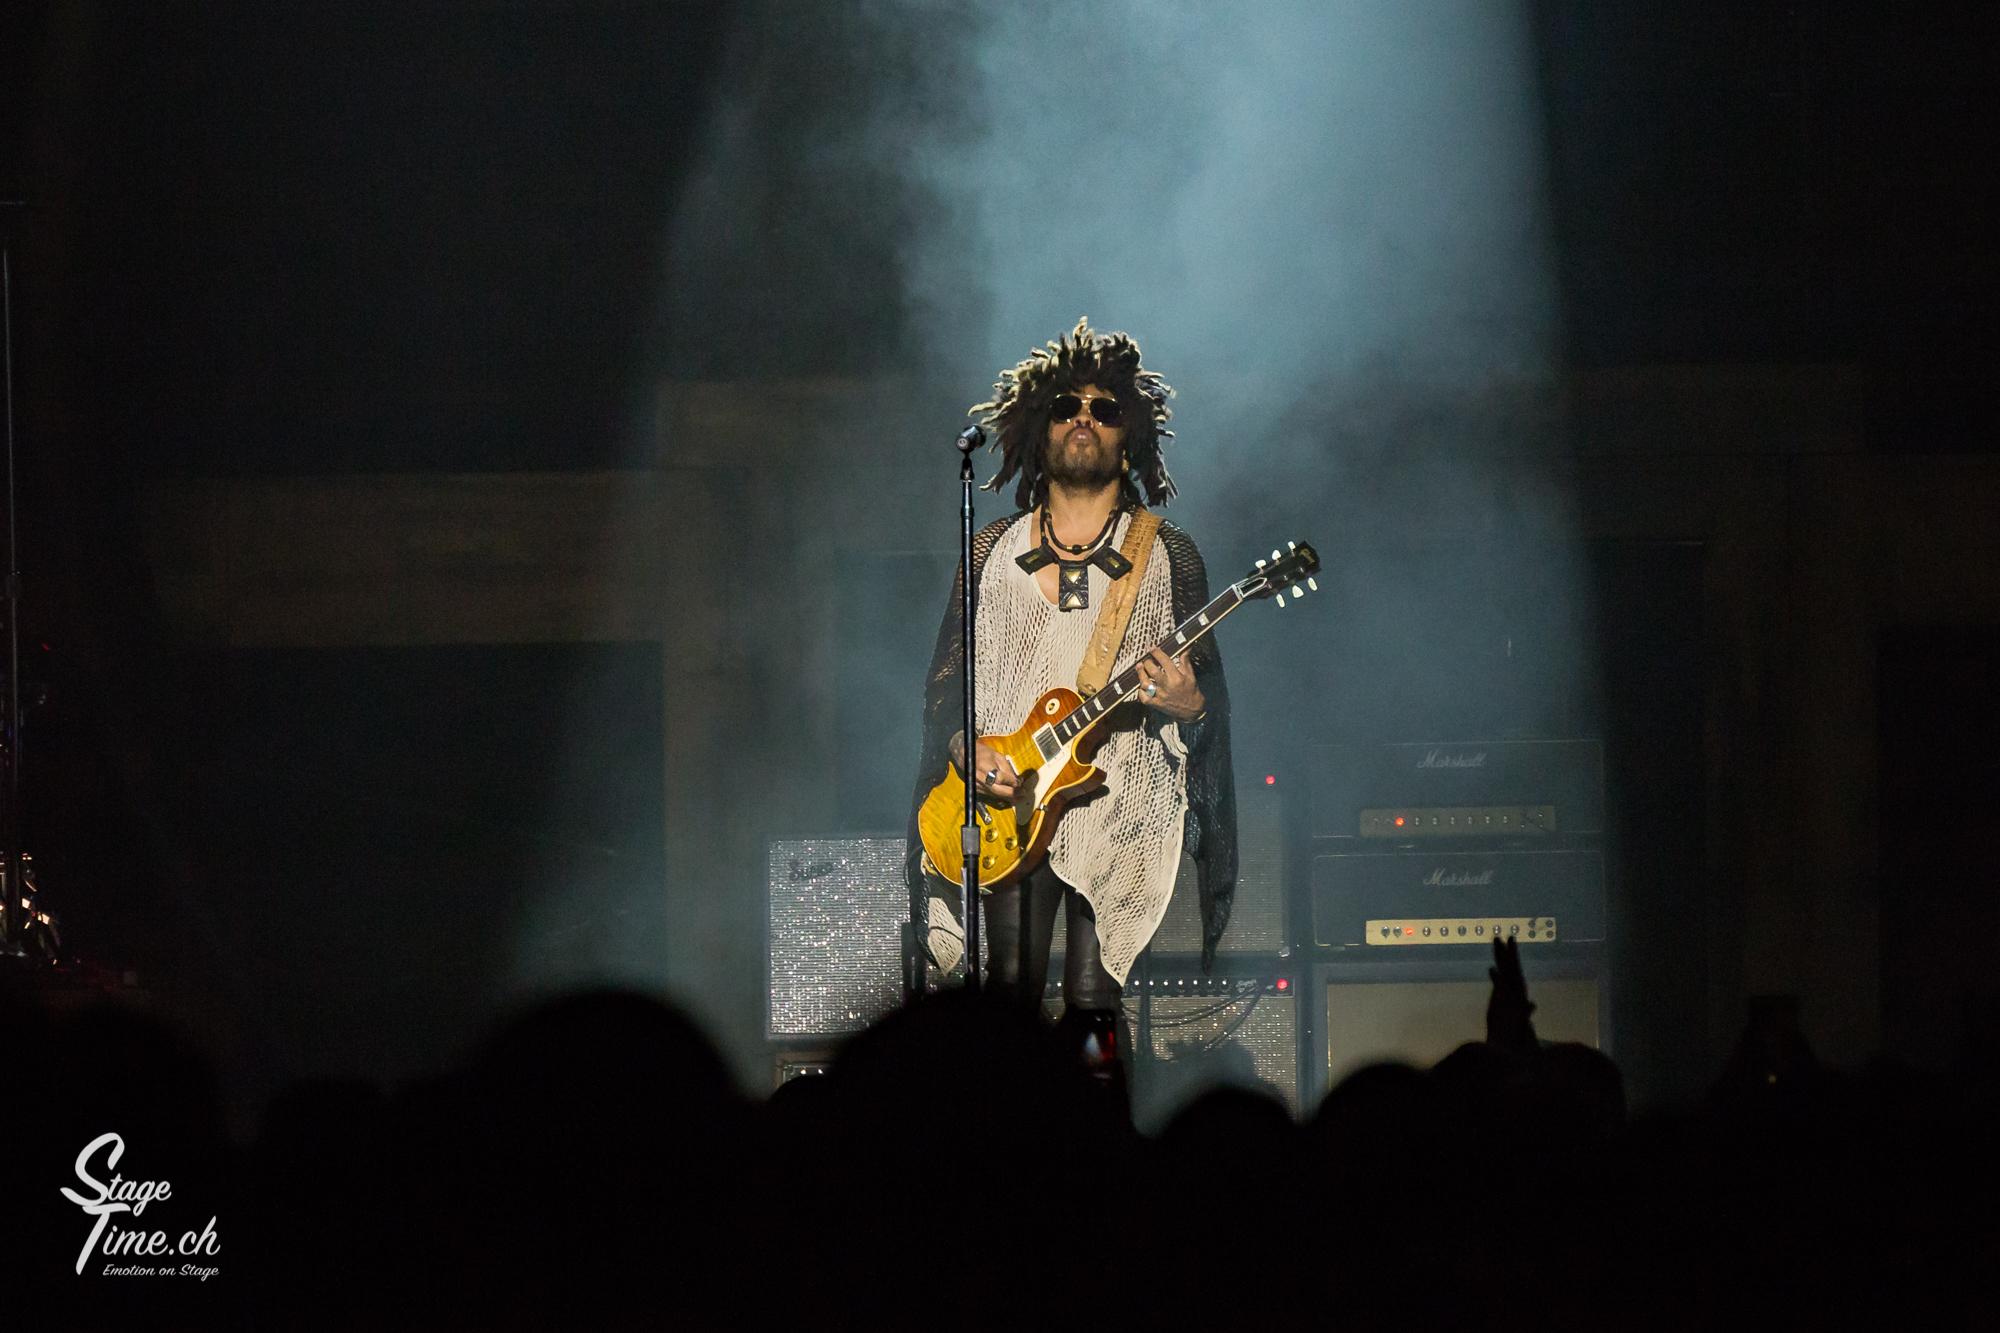 Lenny_Kravitz___📷_Christoph_Gurtner___stagetime.ch-6